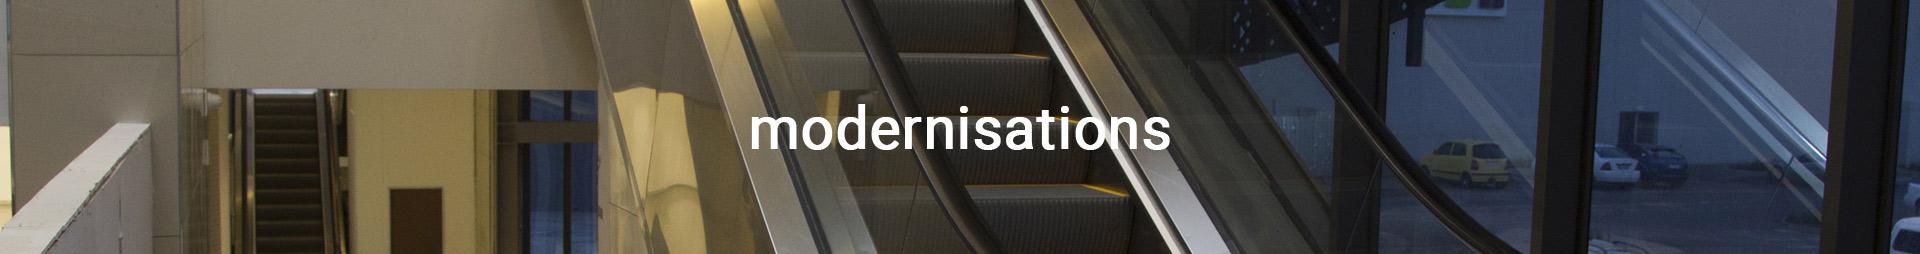 Modernisations